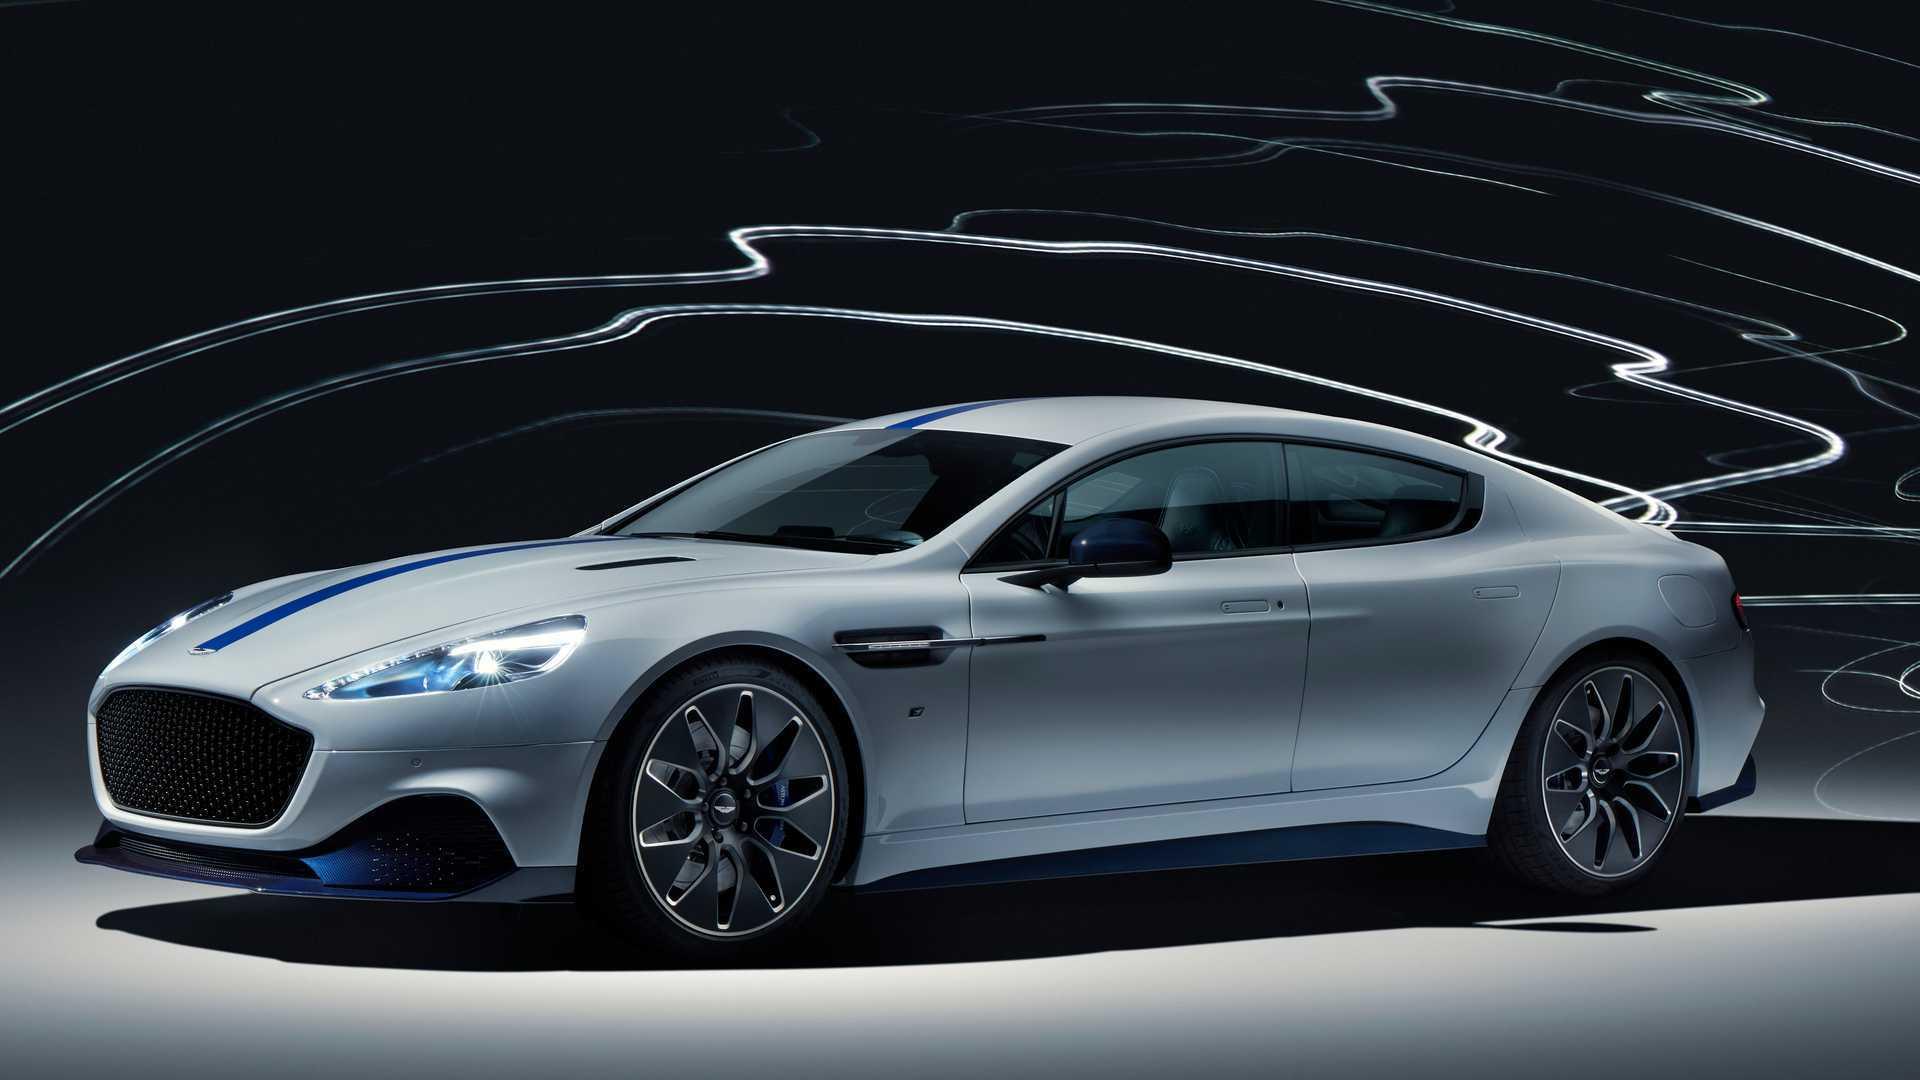 Представлен серийный электрокар Aston Martin Rapide E